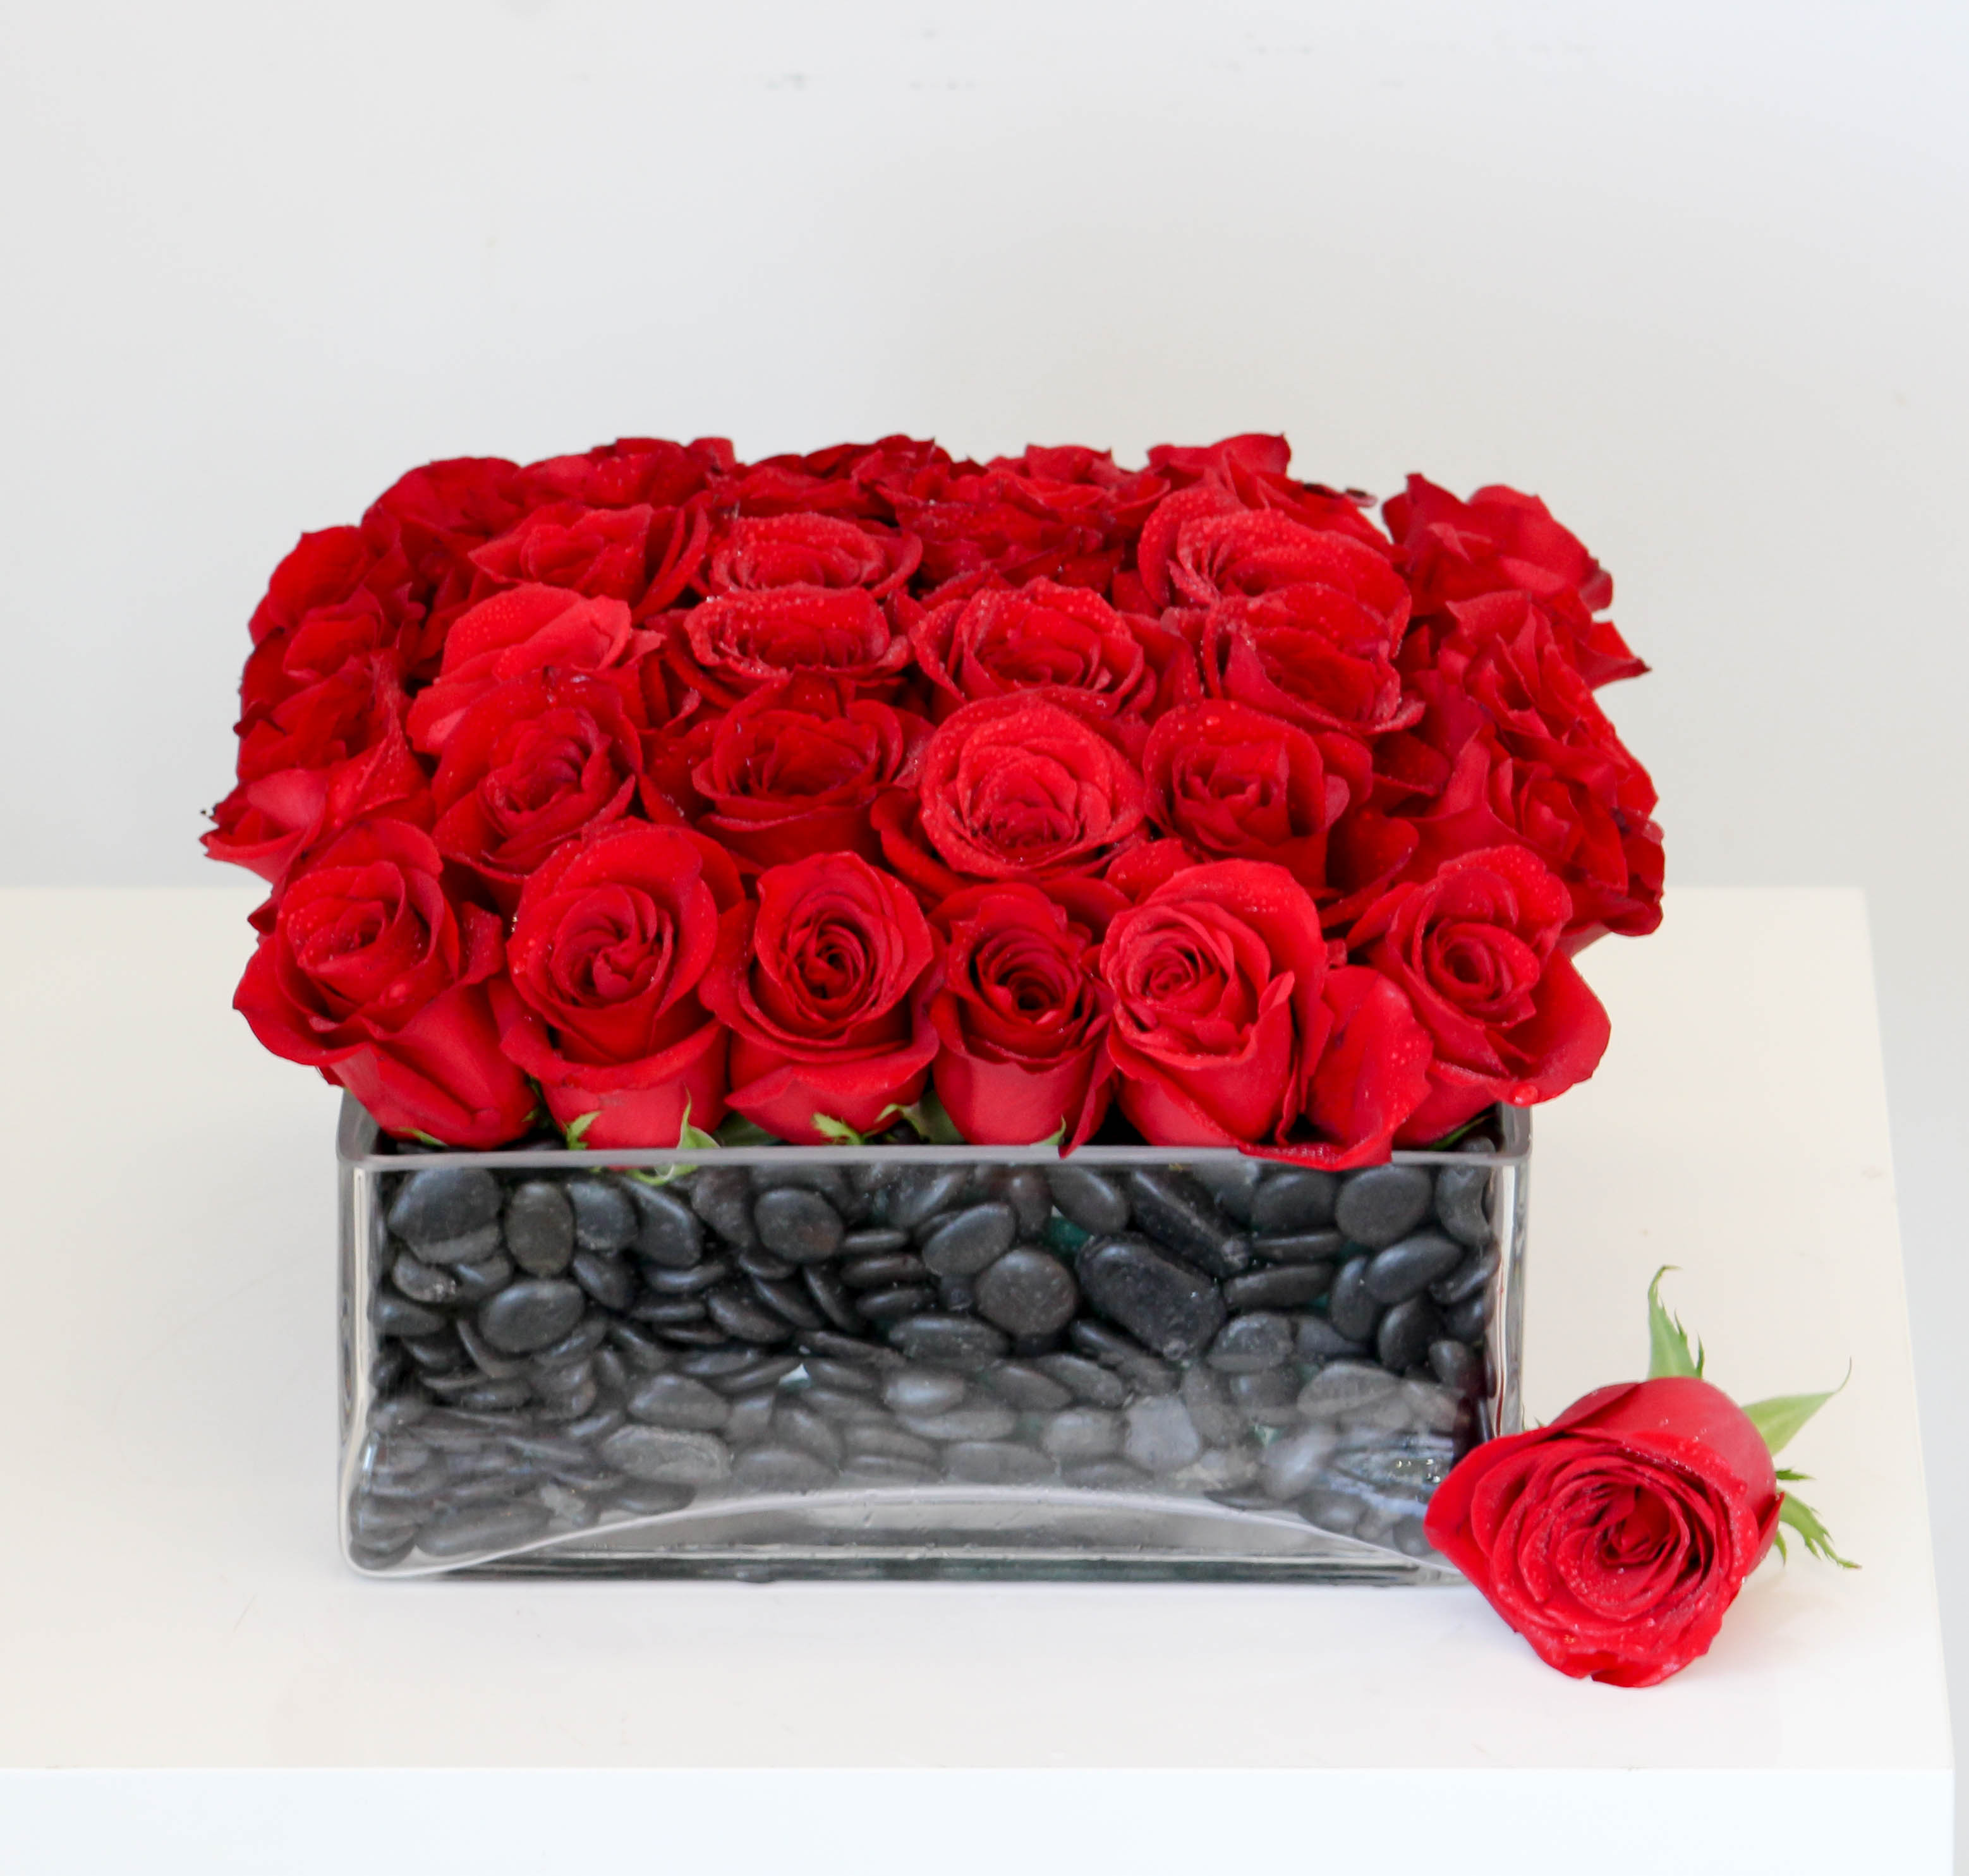 Bed Of Roses In Los Angeles Ca Sonny Alexander Flowers